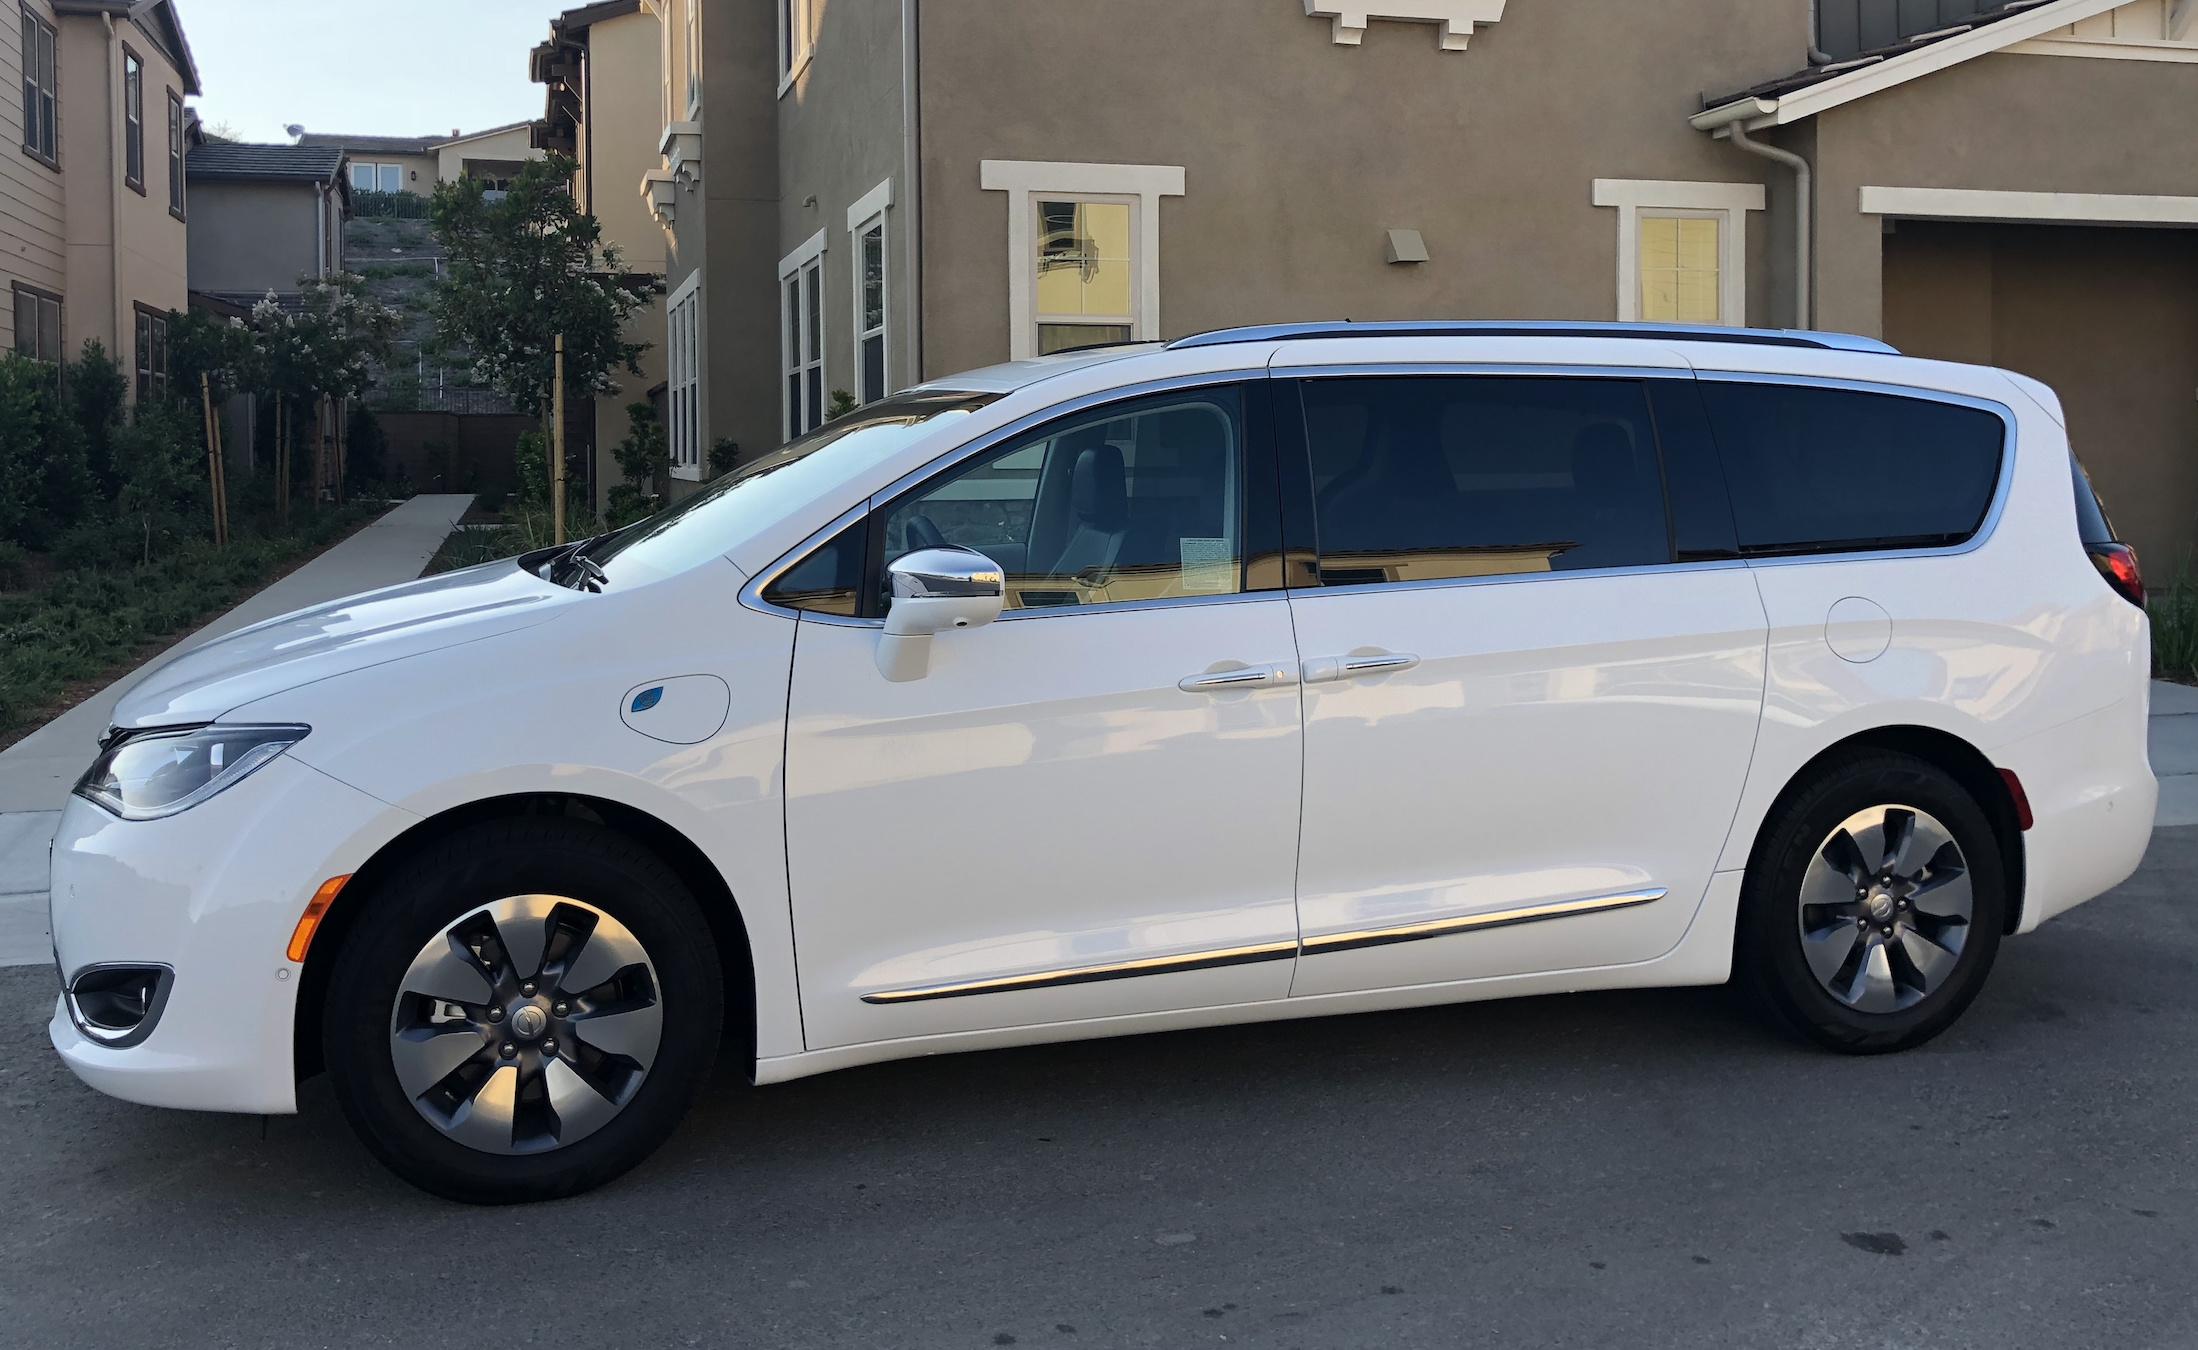 2018 Chrysler Pacifica Hybrid Limited Minivan 458 Mo Incl Tax